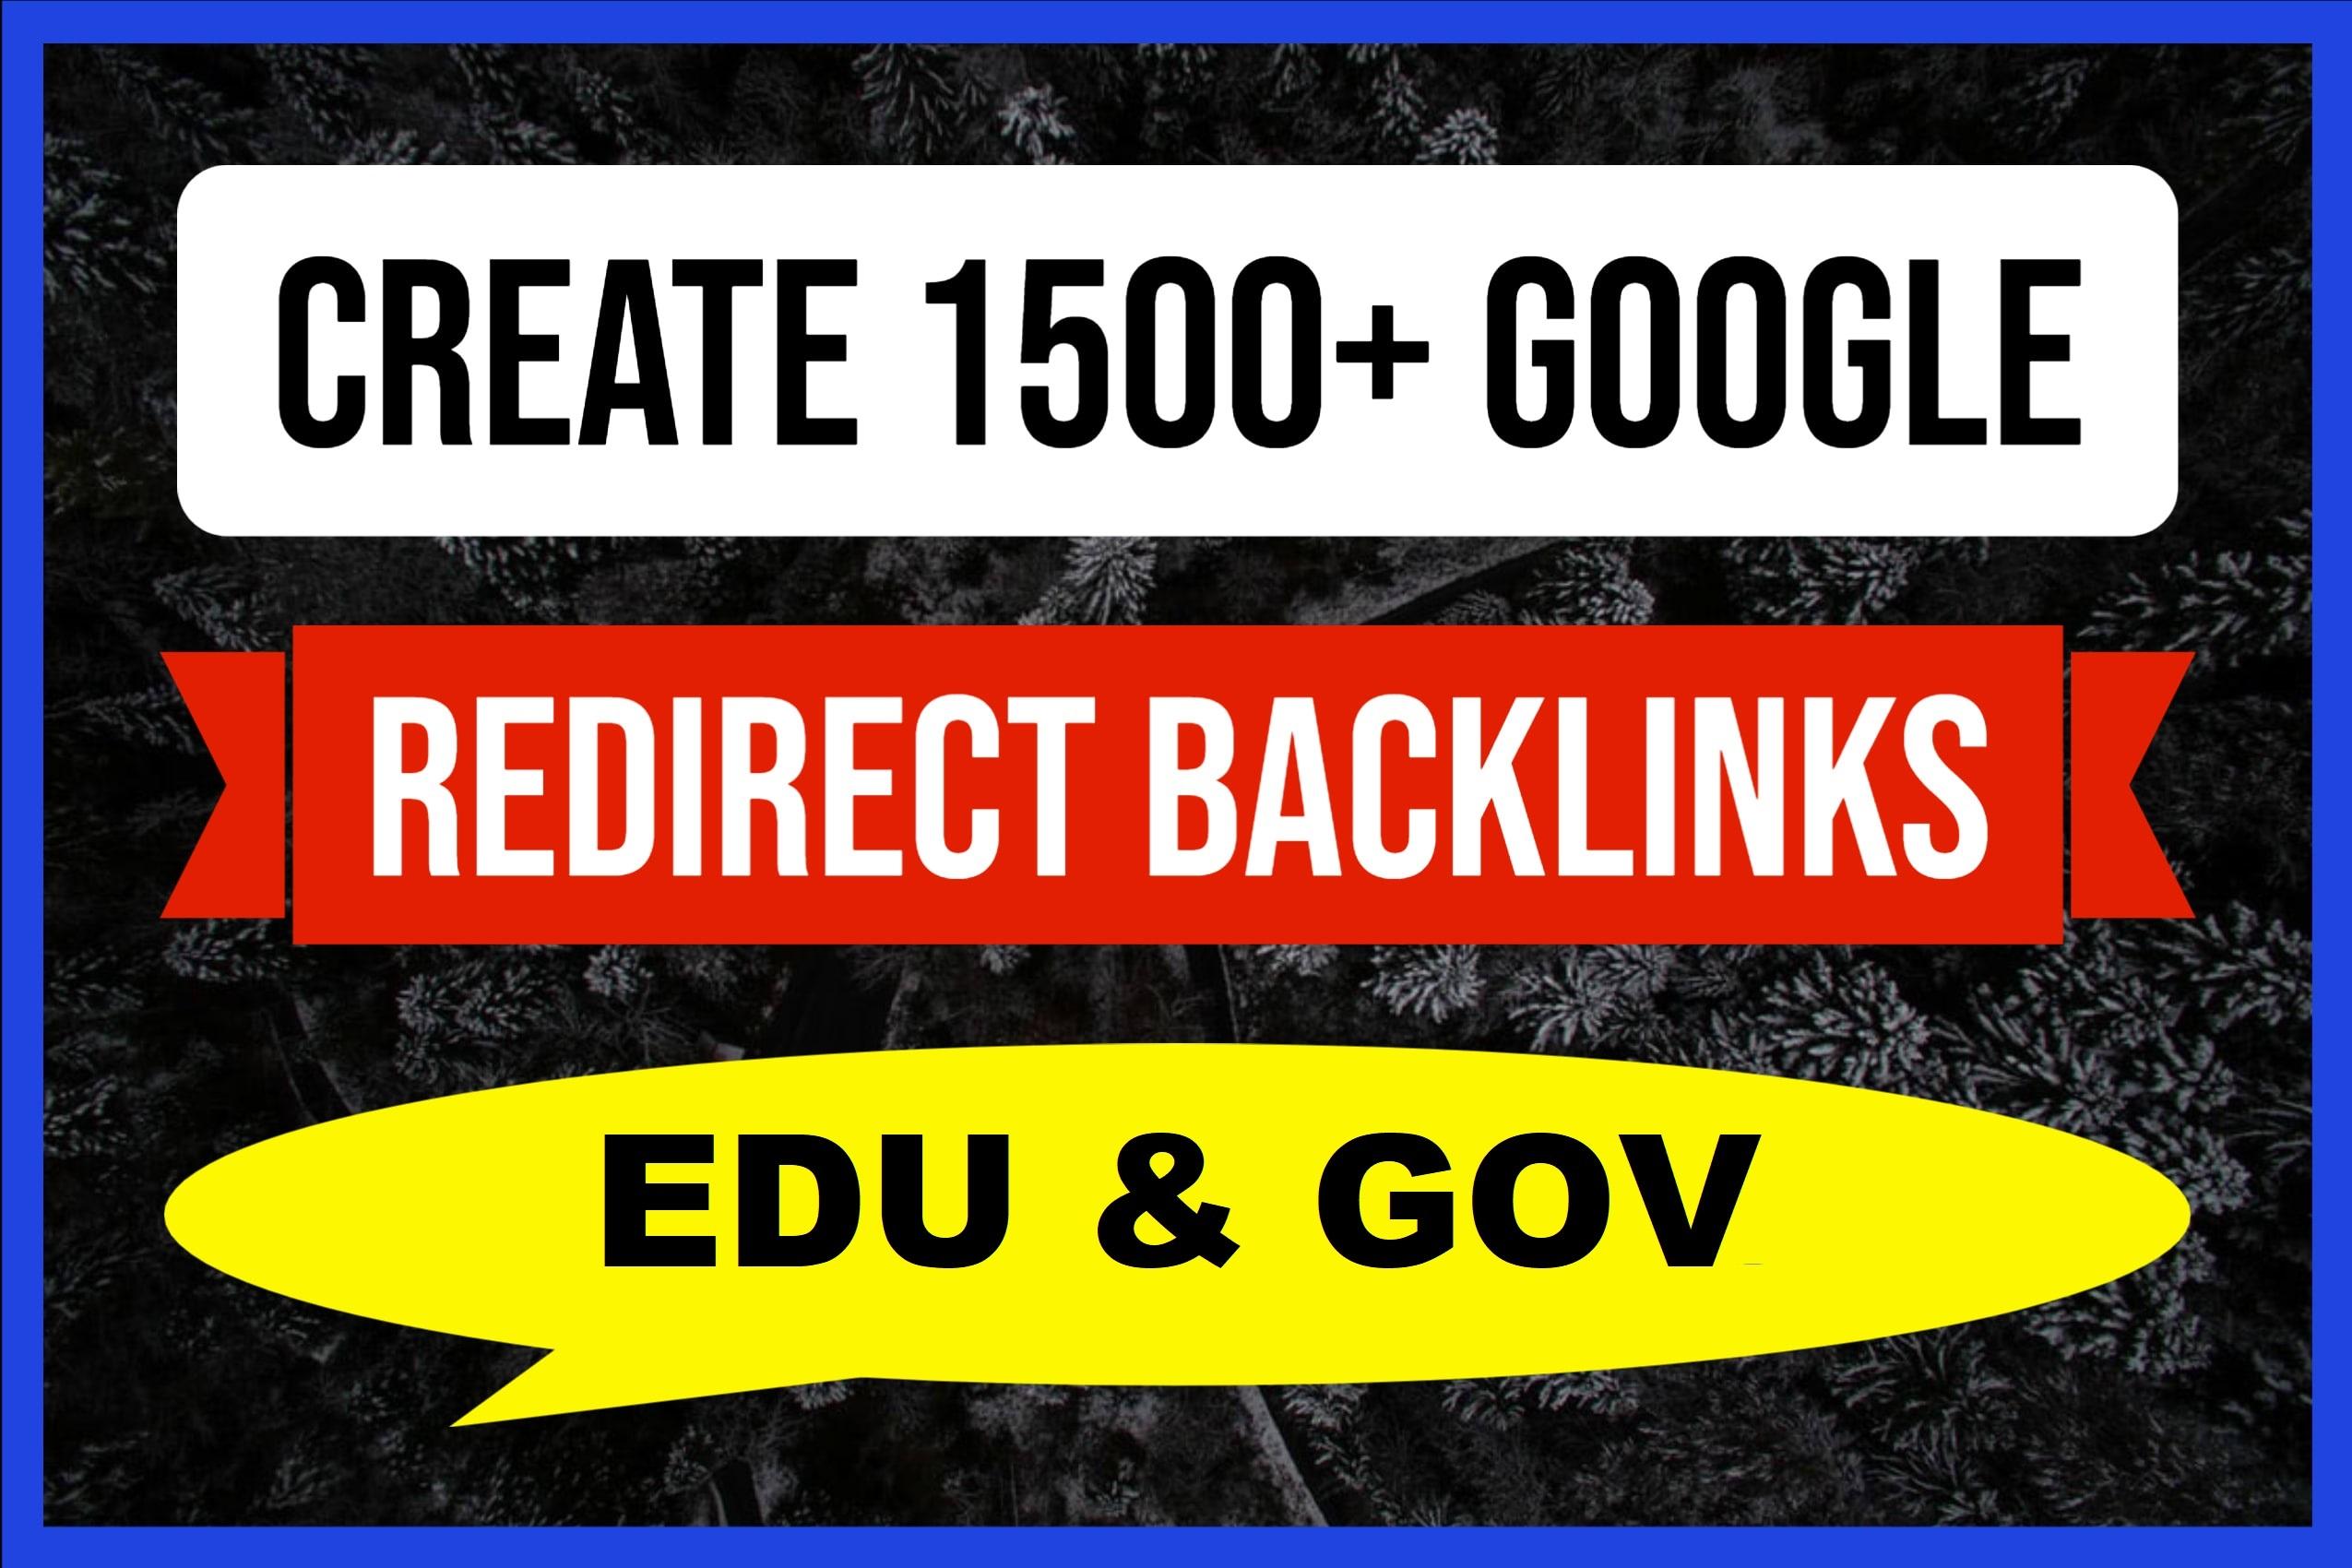 We Create 1500 Edu and Gov Redirect Backlinks